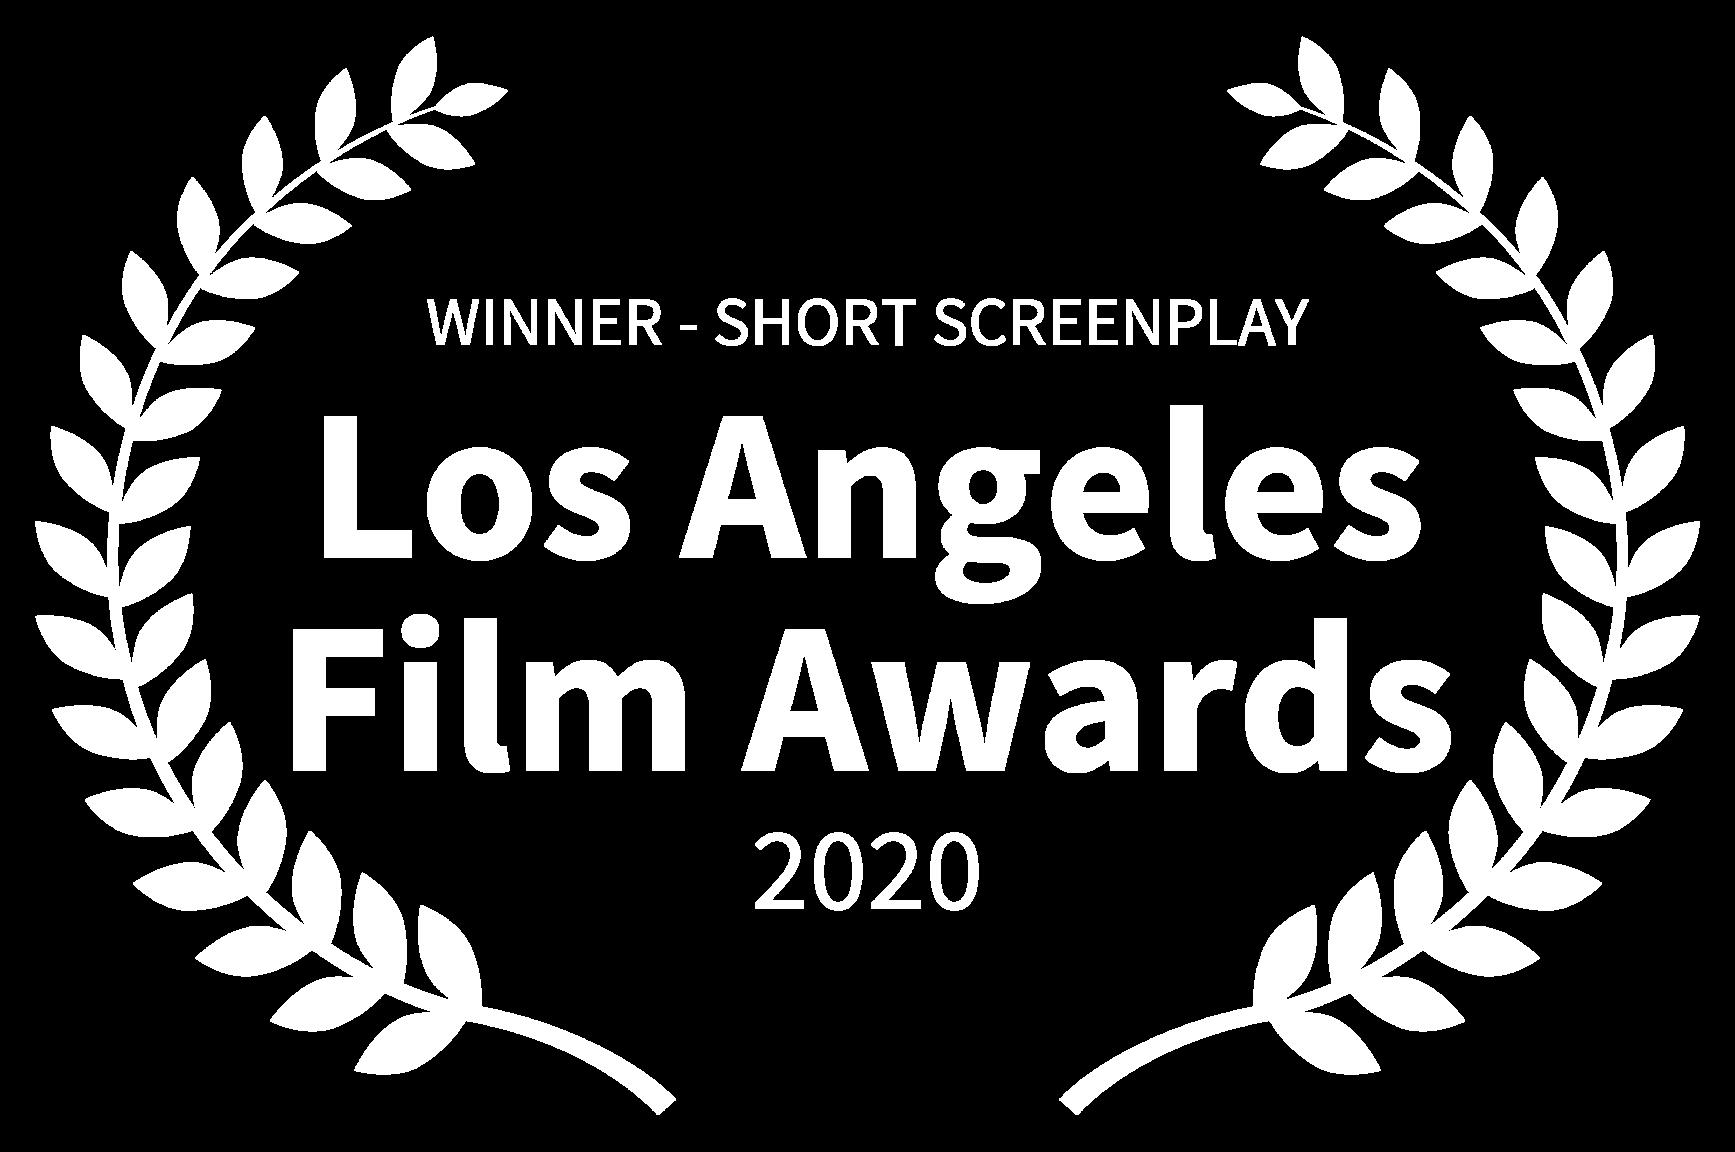 WINNER - SHORT SCREENPLAY - Los Angeles Film Awards - 2020